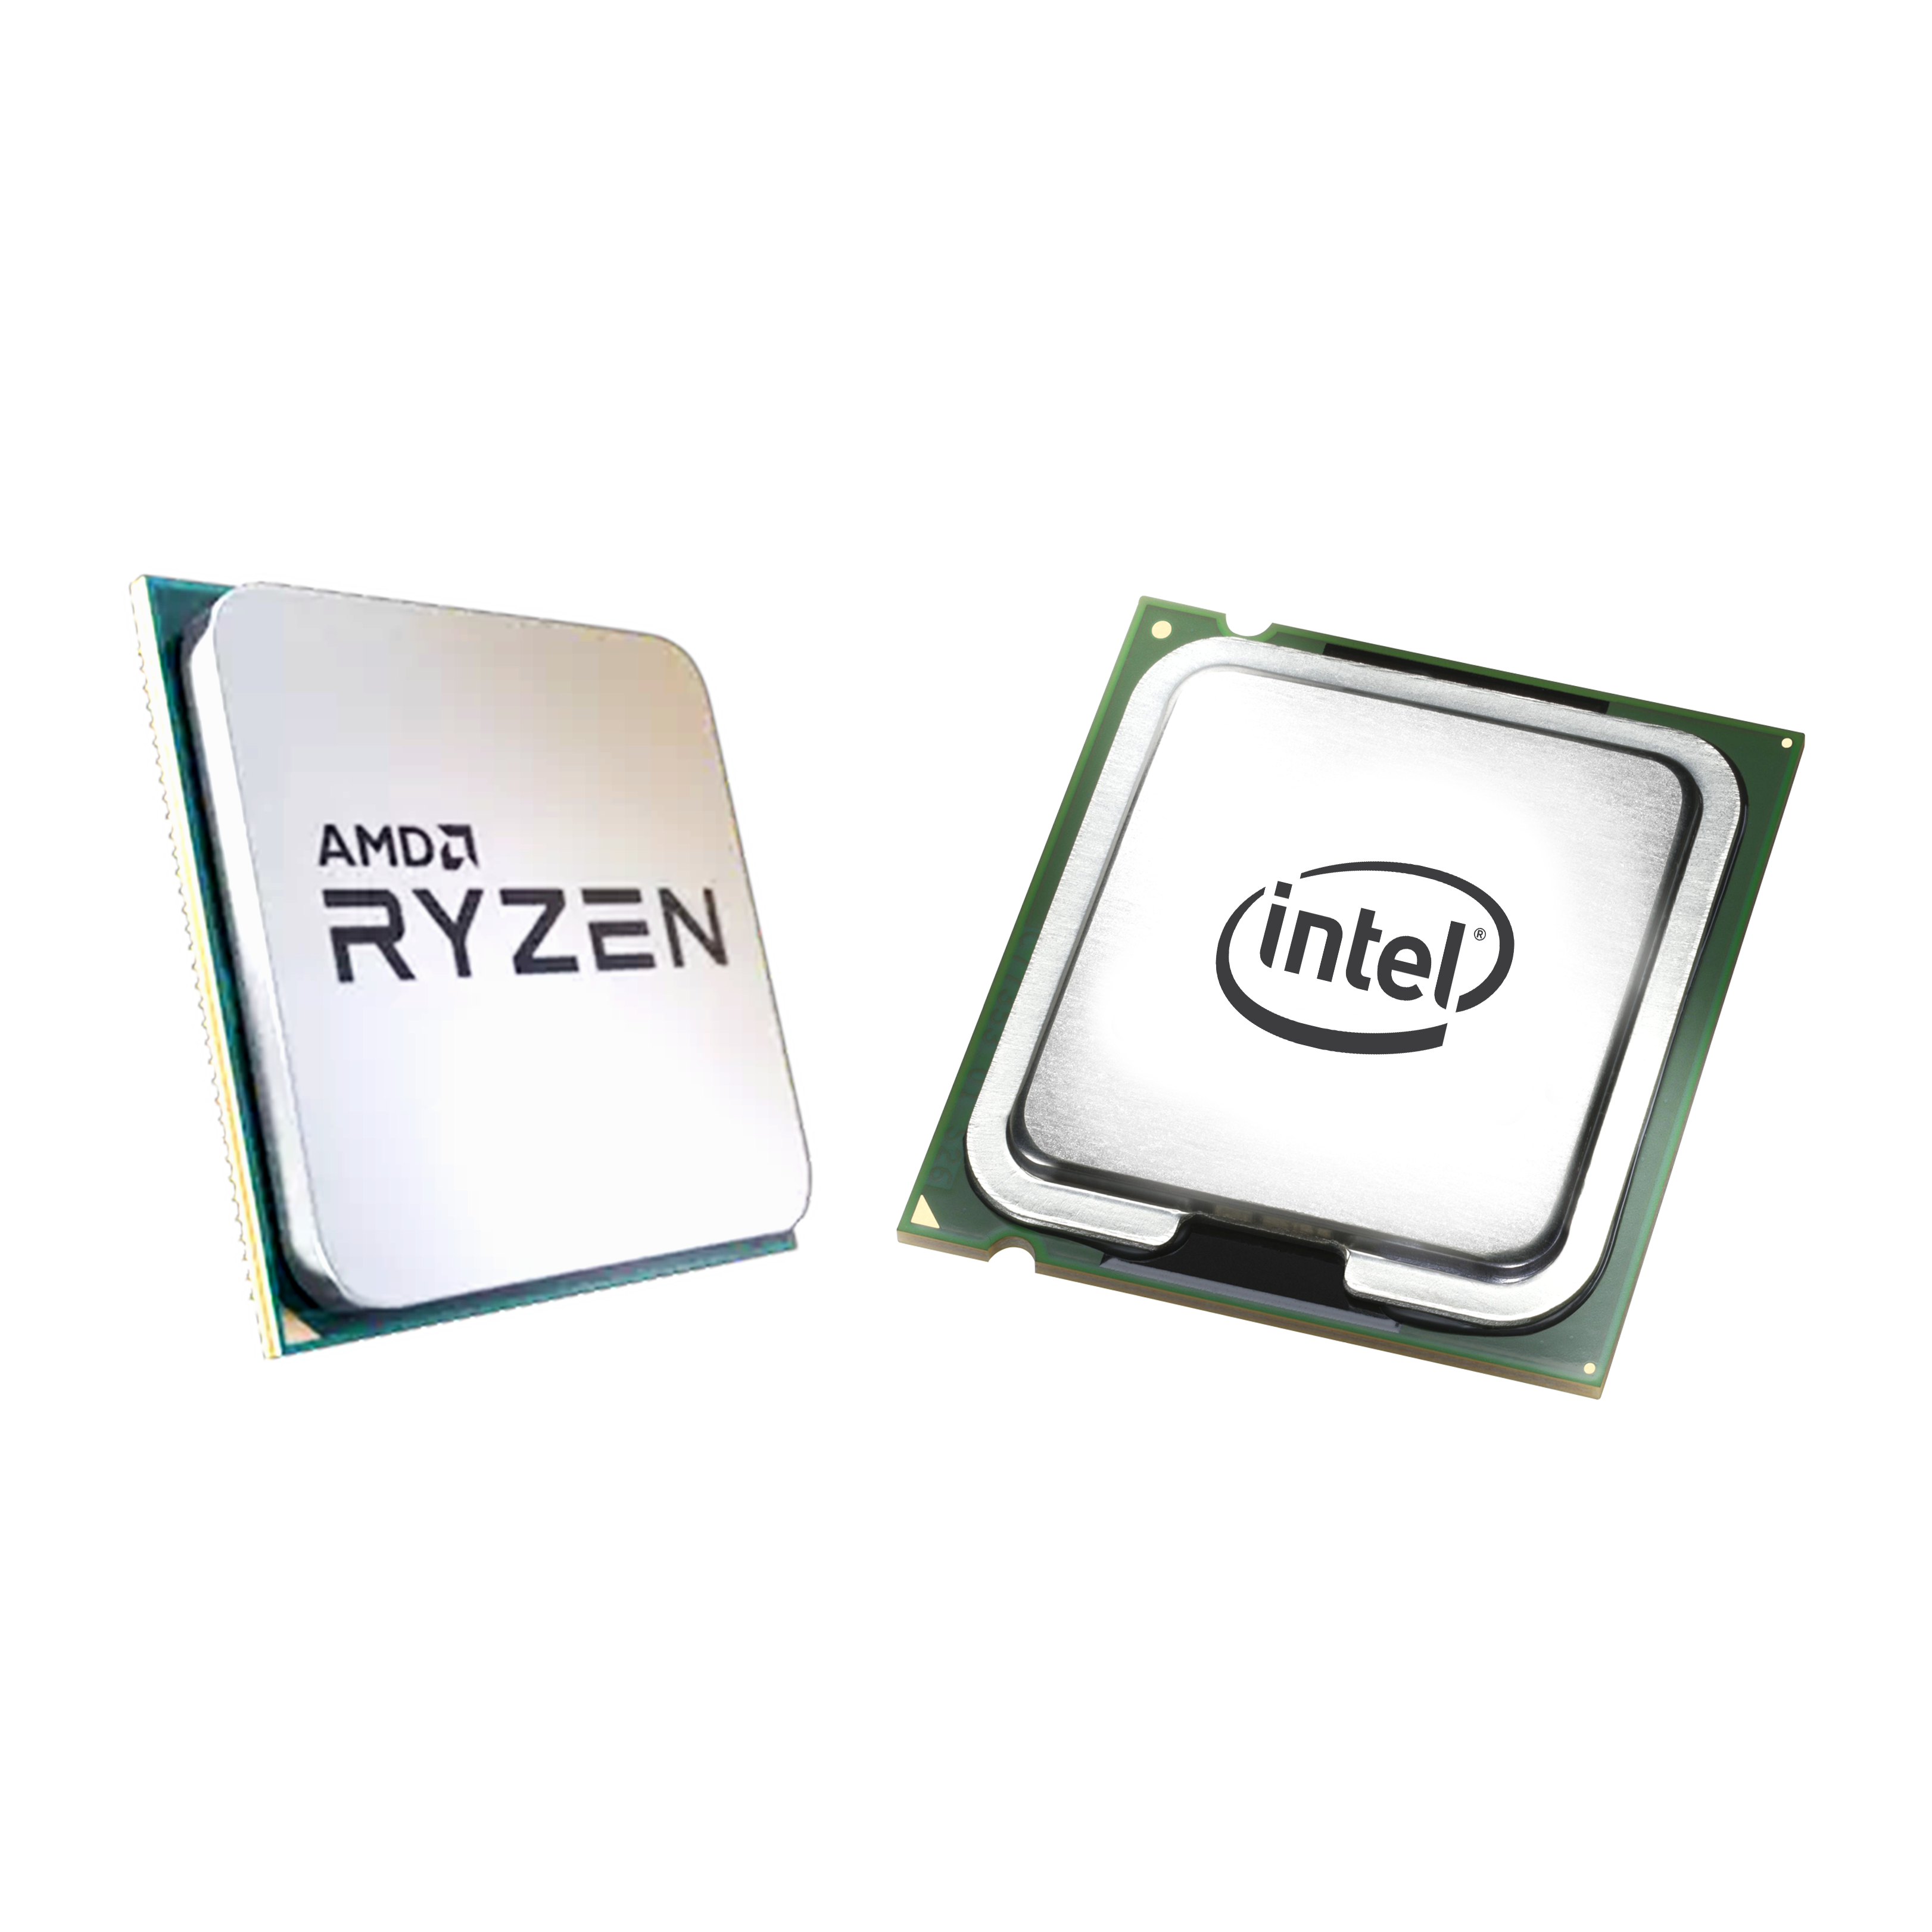 Intel Vs Amd Intel Amd Semiconductor